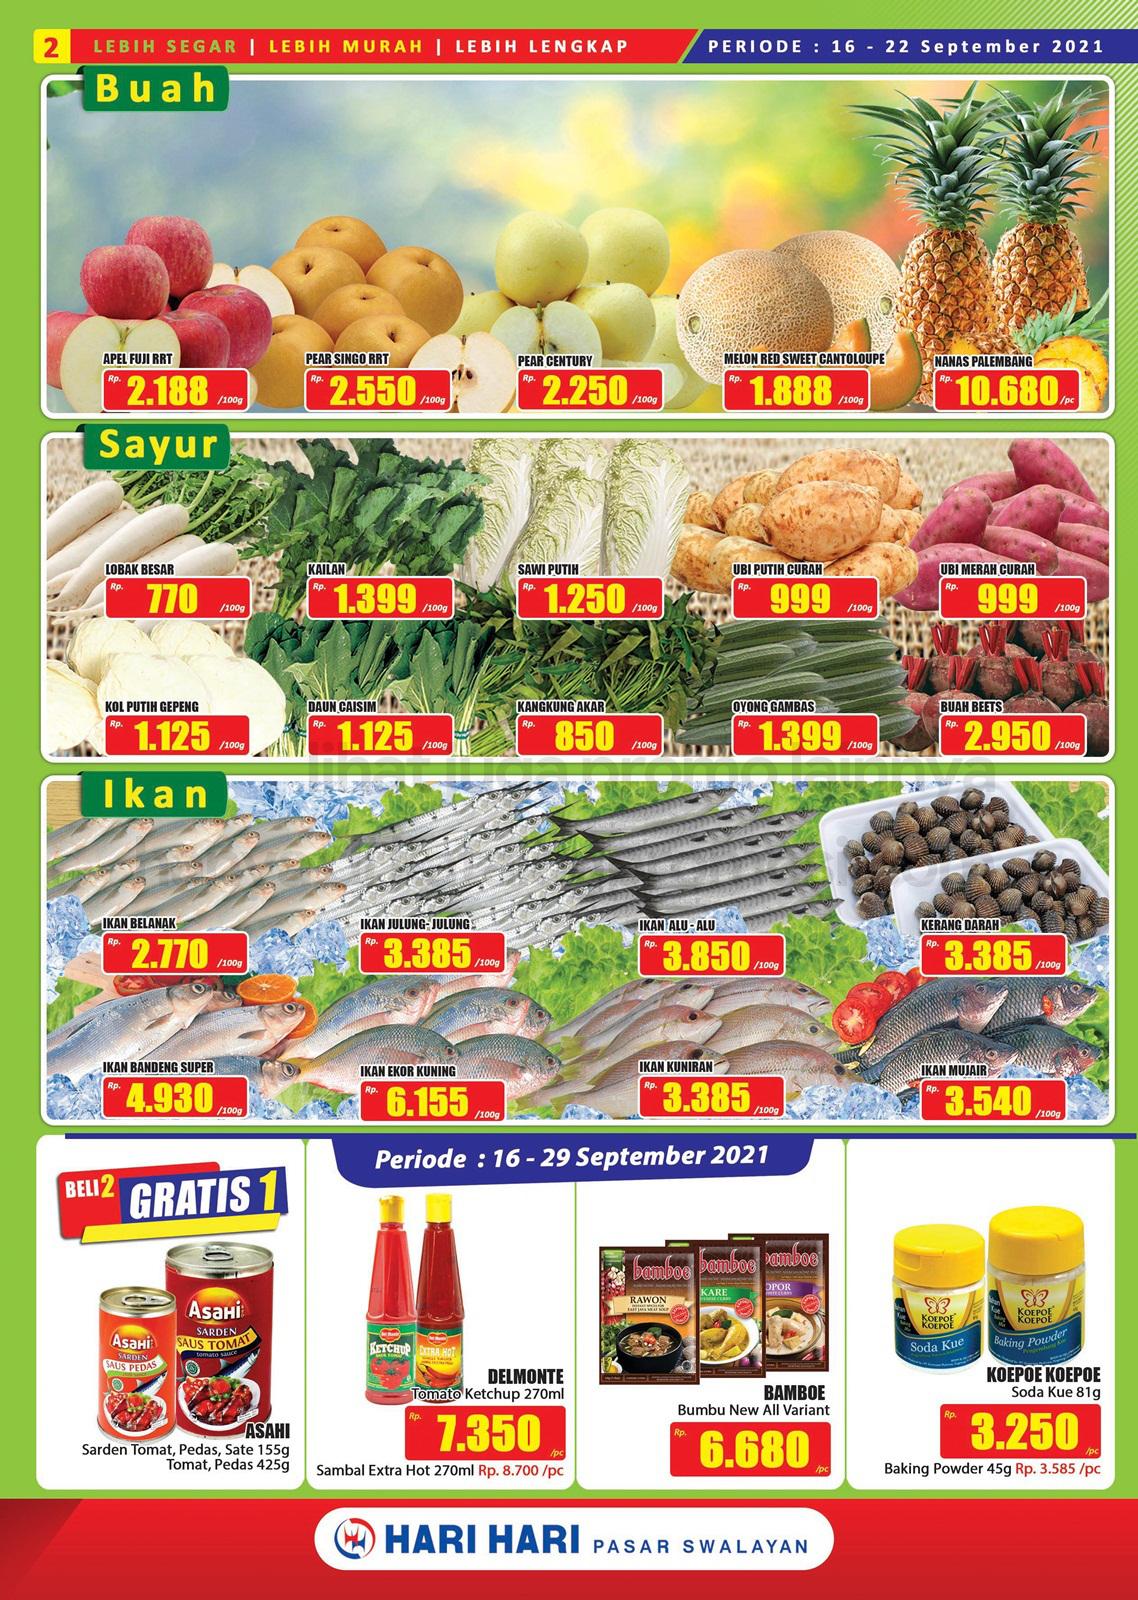 Promo Hari Hari Pasar Swalayan Katalog Mingguan Periode 16-29 September 2021